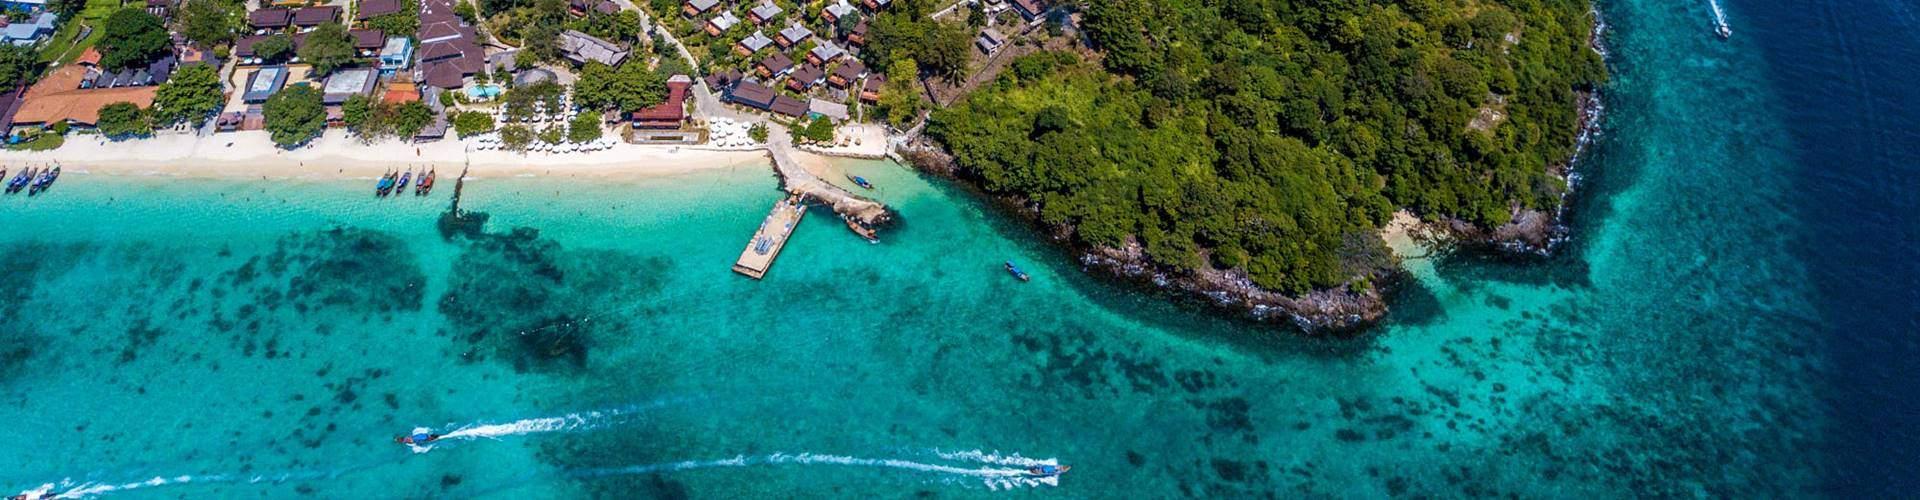 koh phi phi i from long island beach